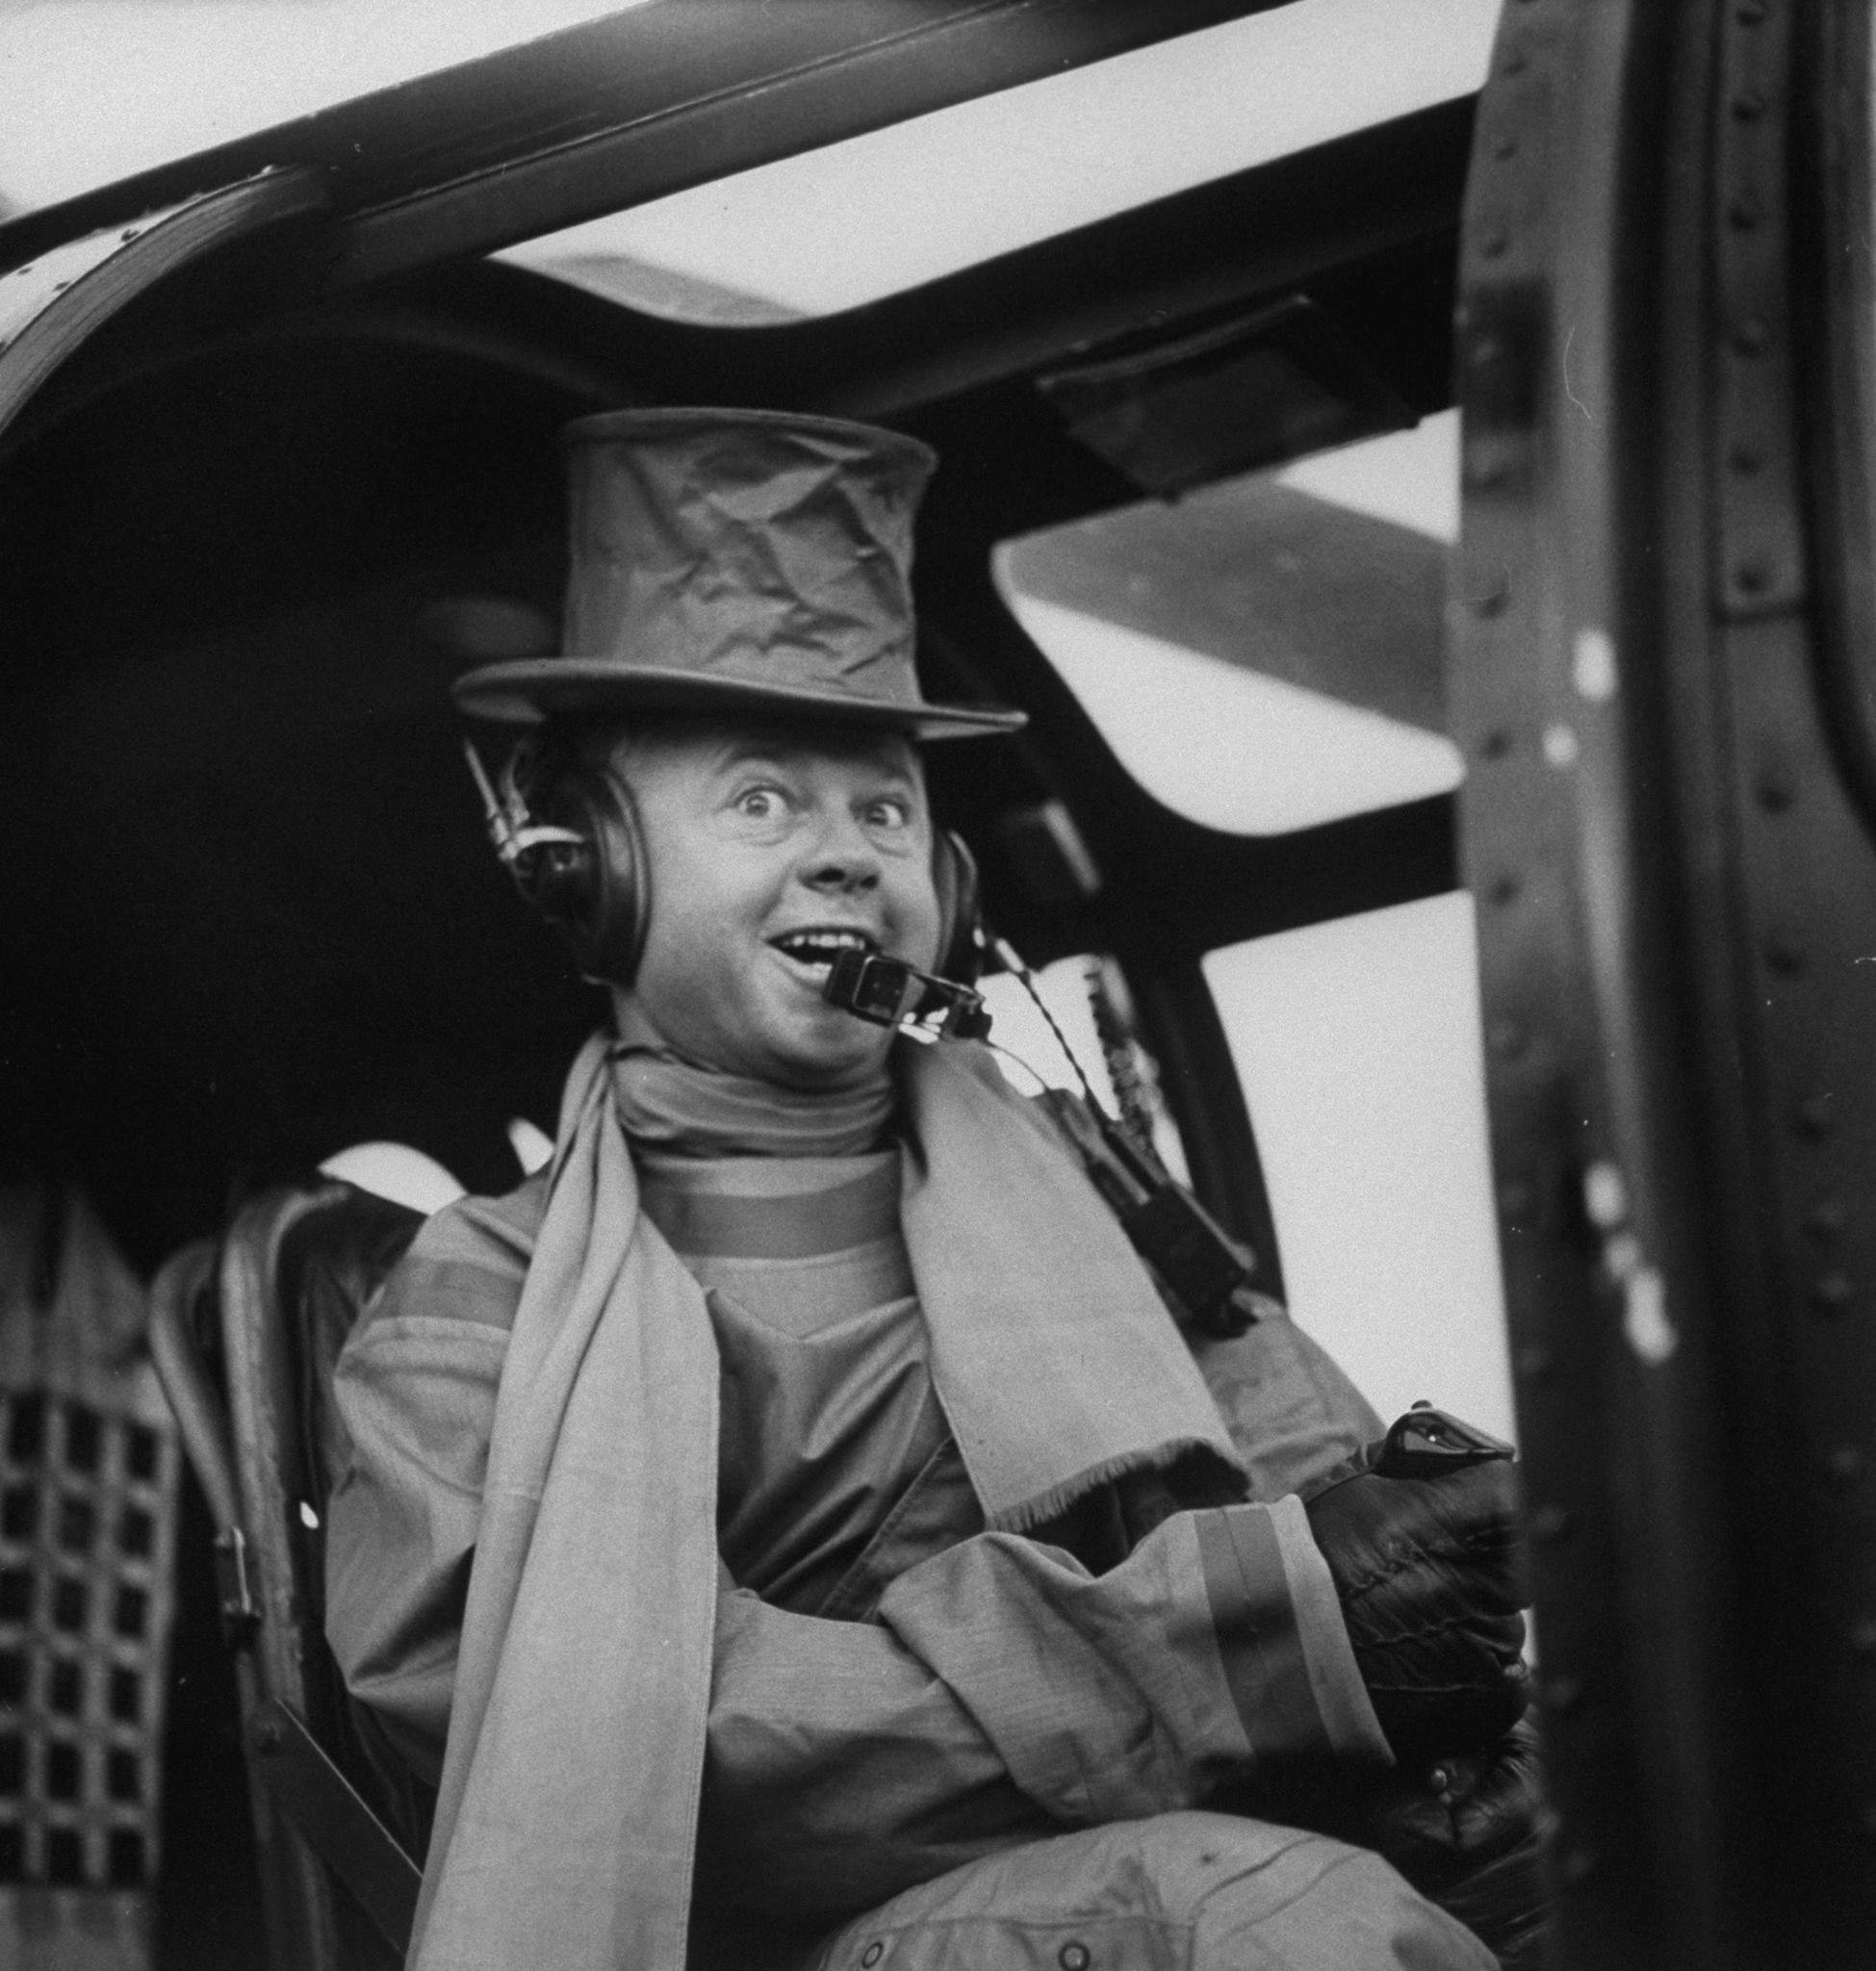 Rooney on the set of the 1955 film <i>Bridges of Toko-Ri</i>.